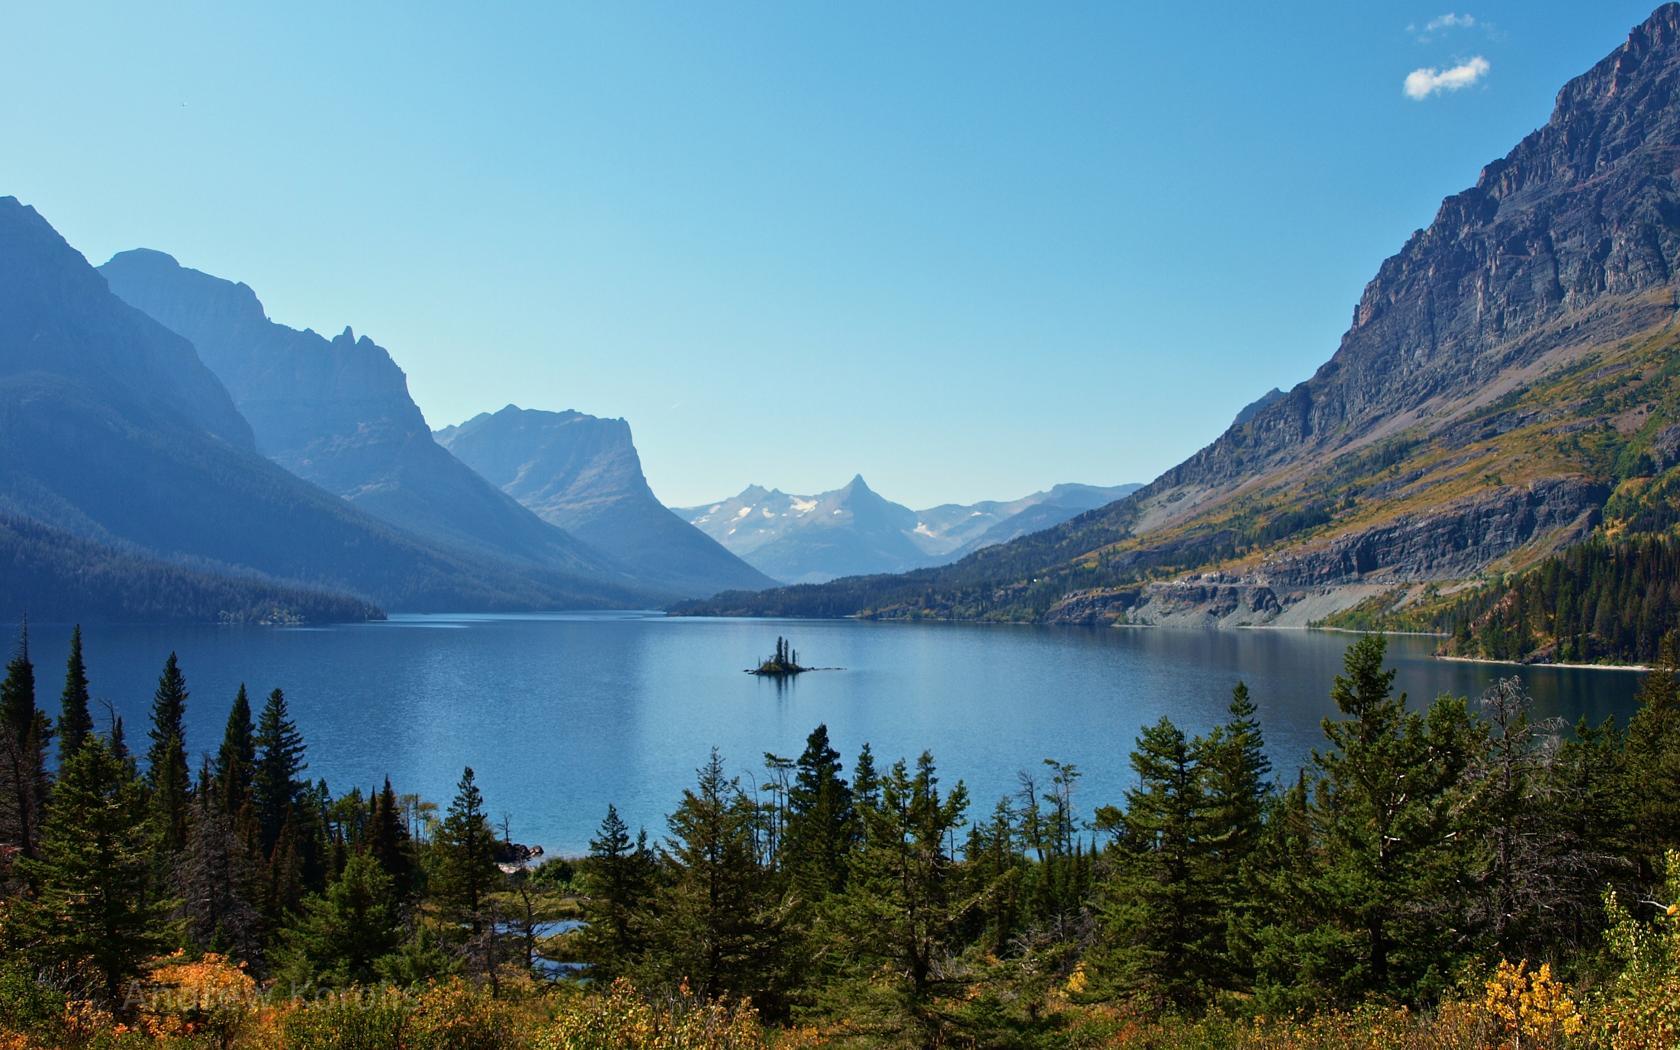 Goose Lake Wa Other Sizes: (full) (1...